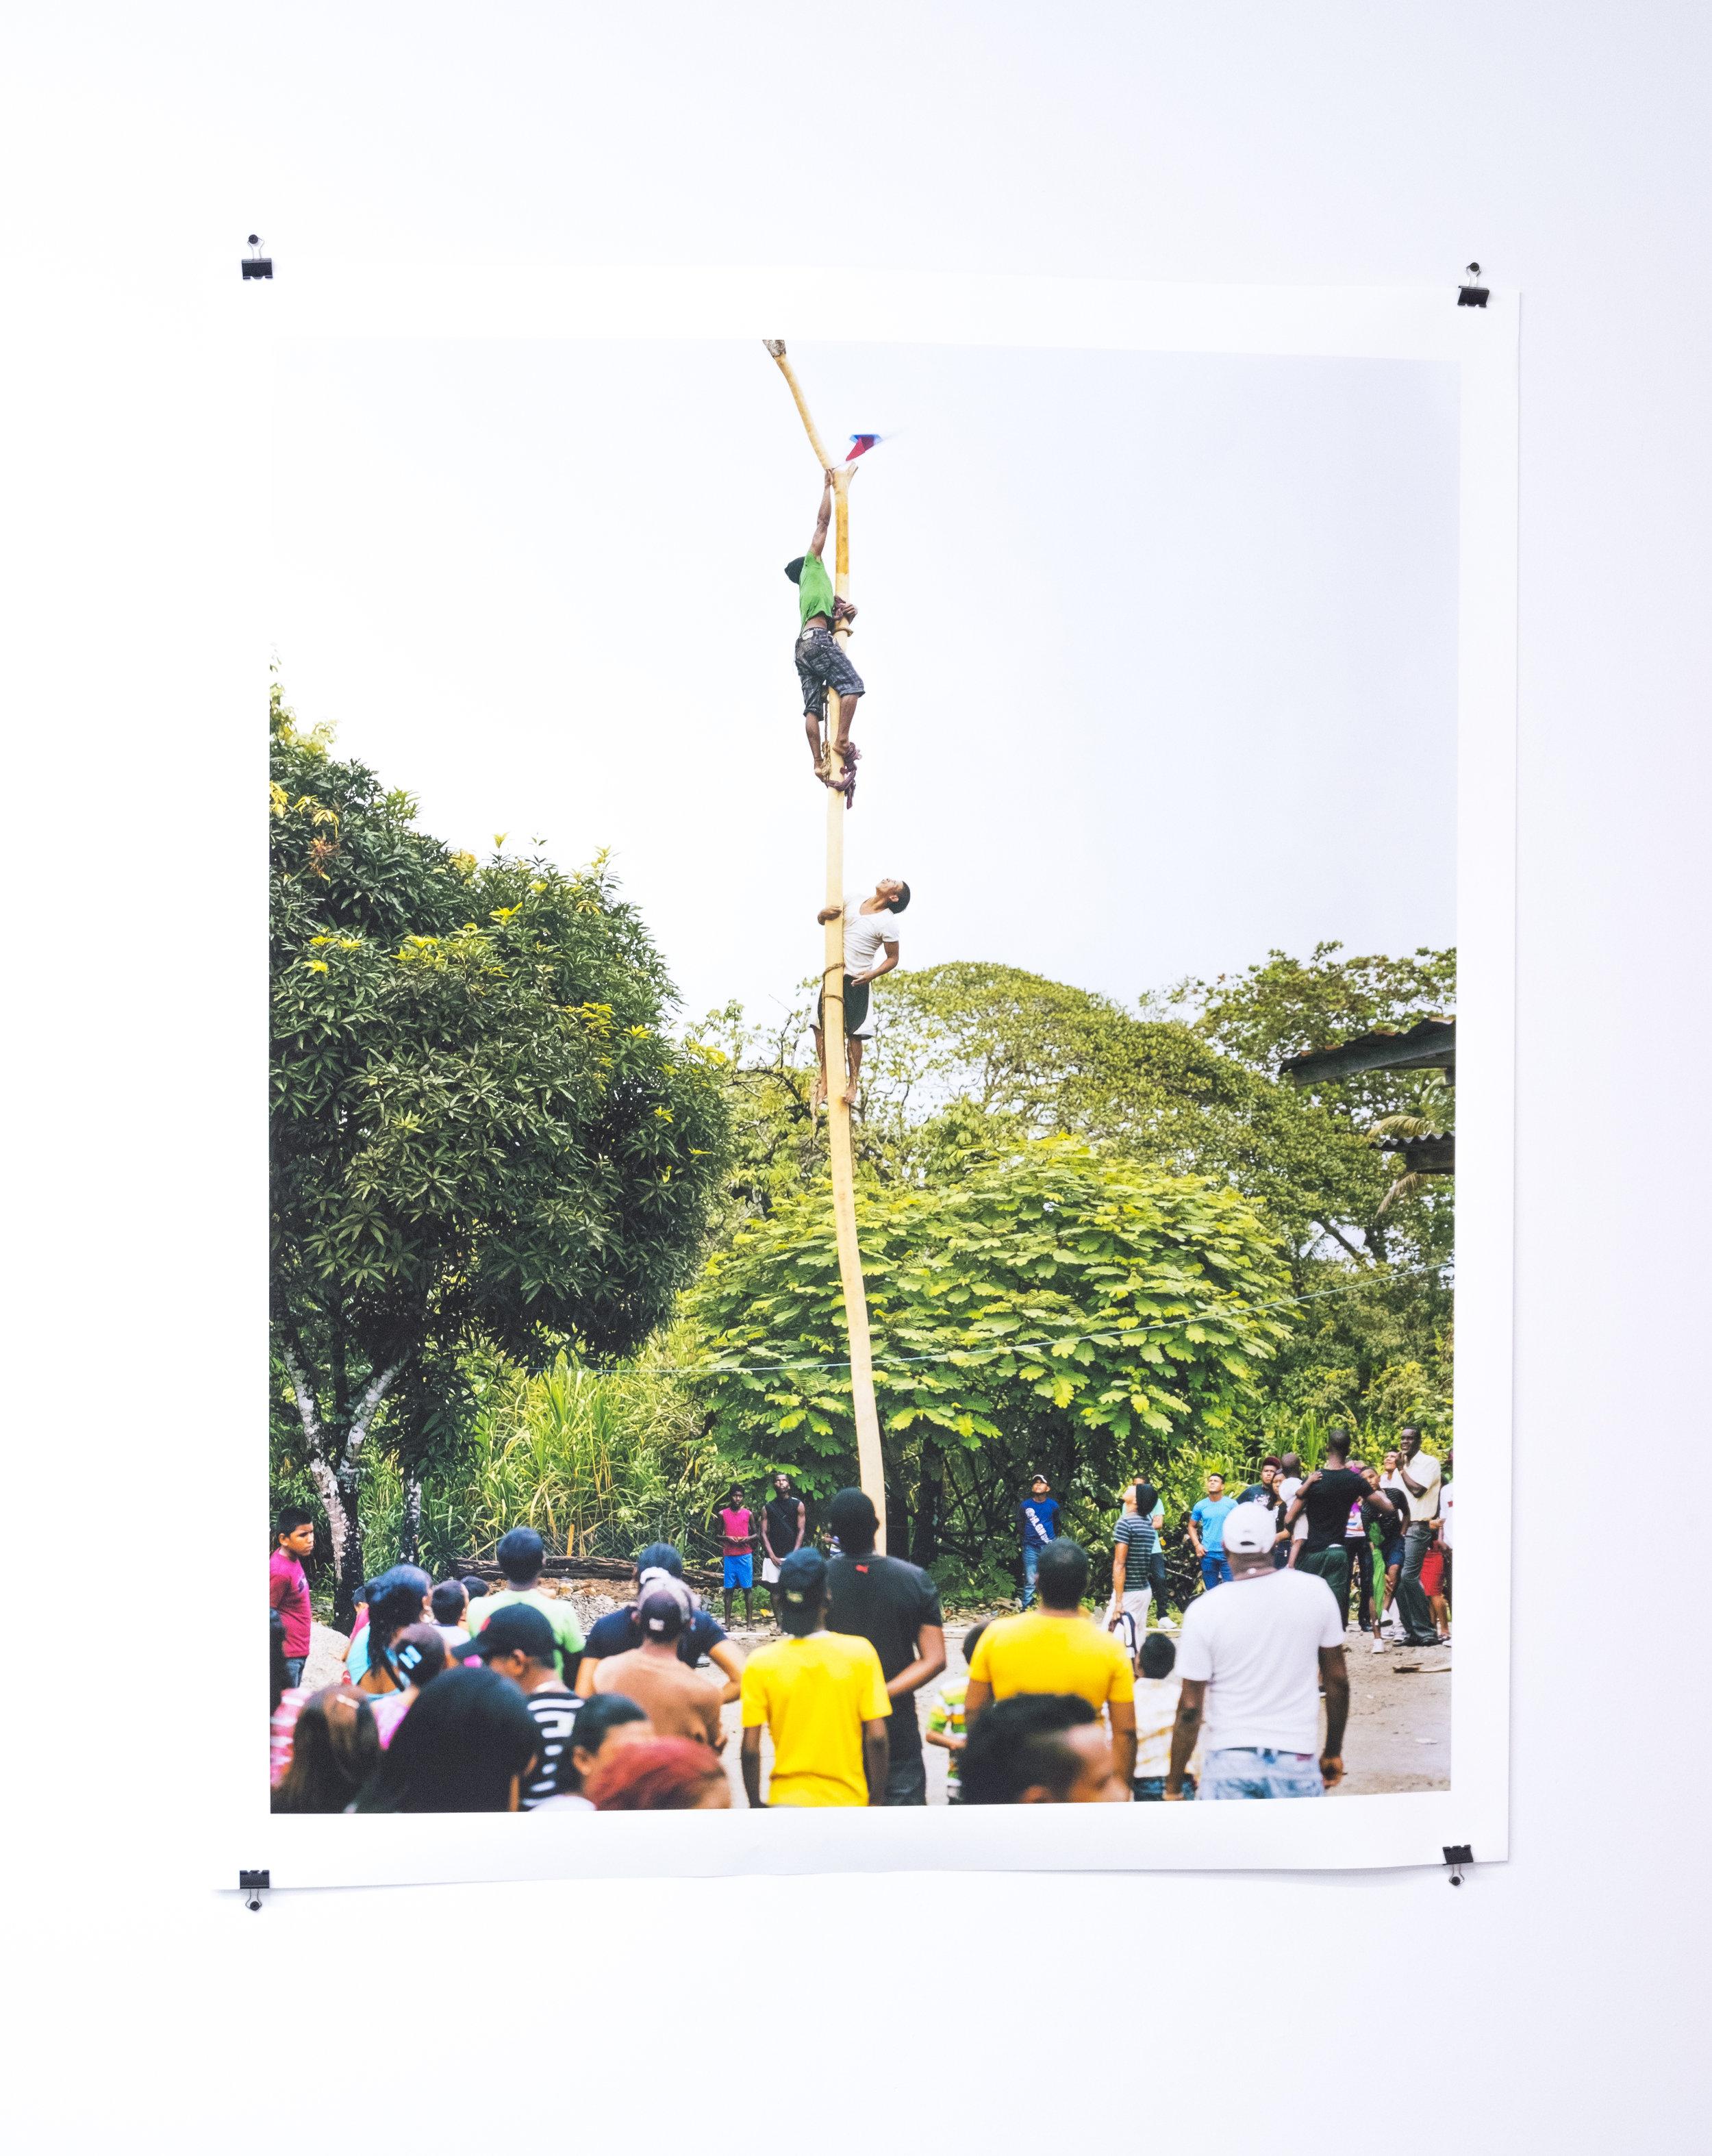 Palo encebao' Maria Chiquita, 2016 / Inkjet print on enhance paper / 54 3/10 x 44 9/10 in